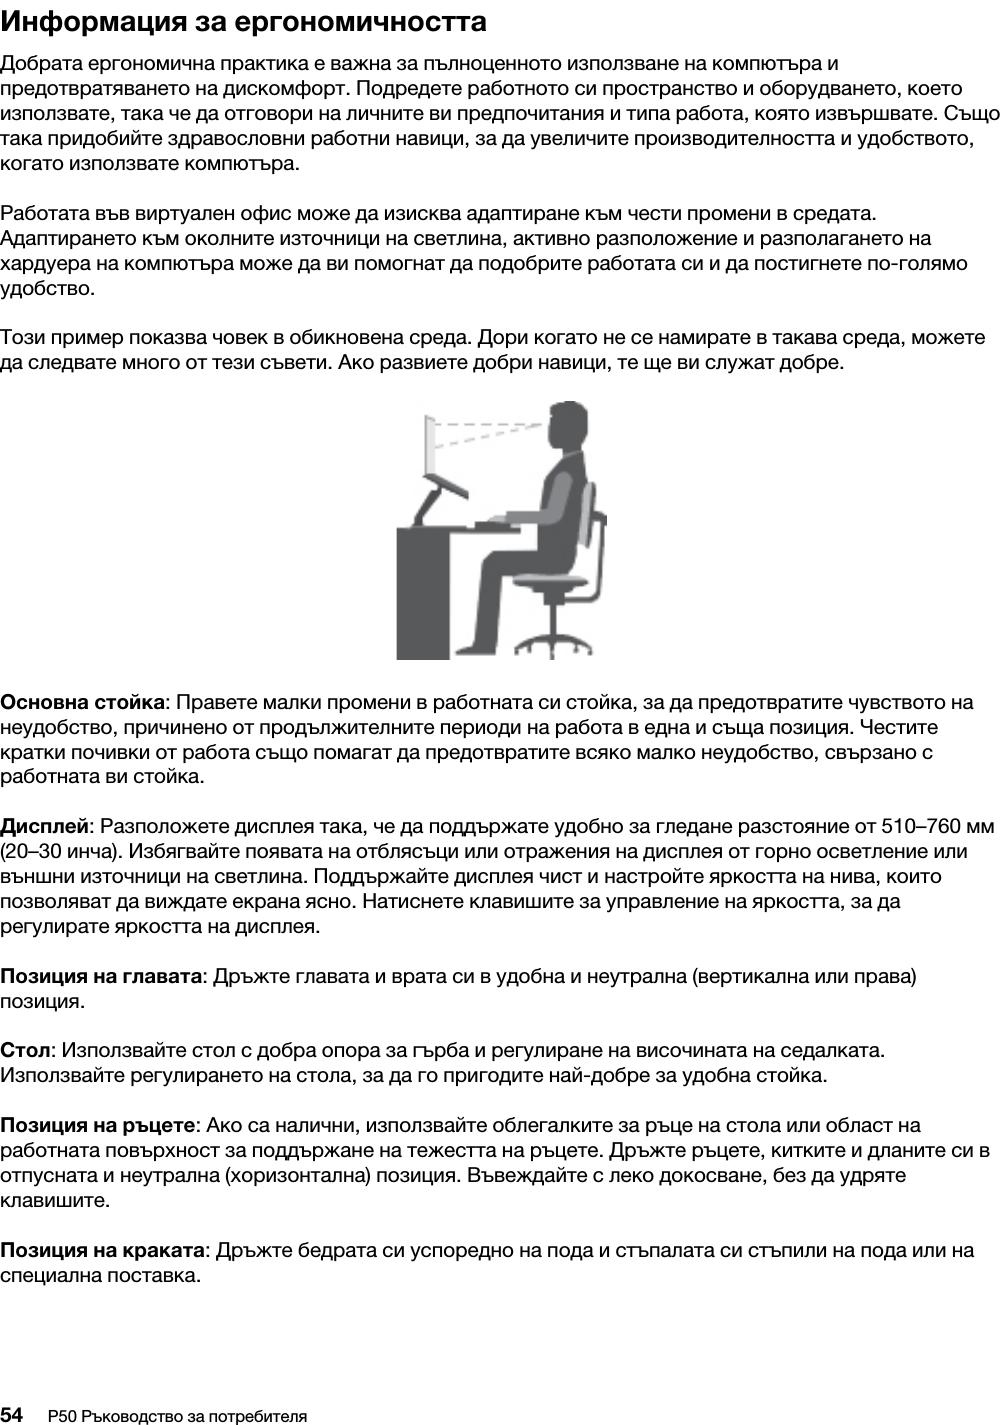 ae9a7167afd Lenovo P50 Ug Bg Ръководство за потребителя User Manual (Bulgarian) Guide  Think Pad Laptop (Think Pad) Type 20EN